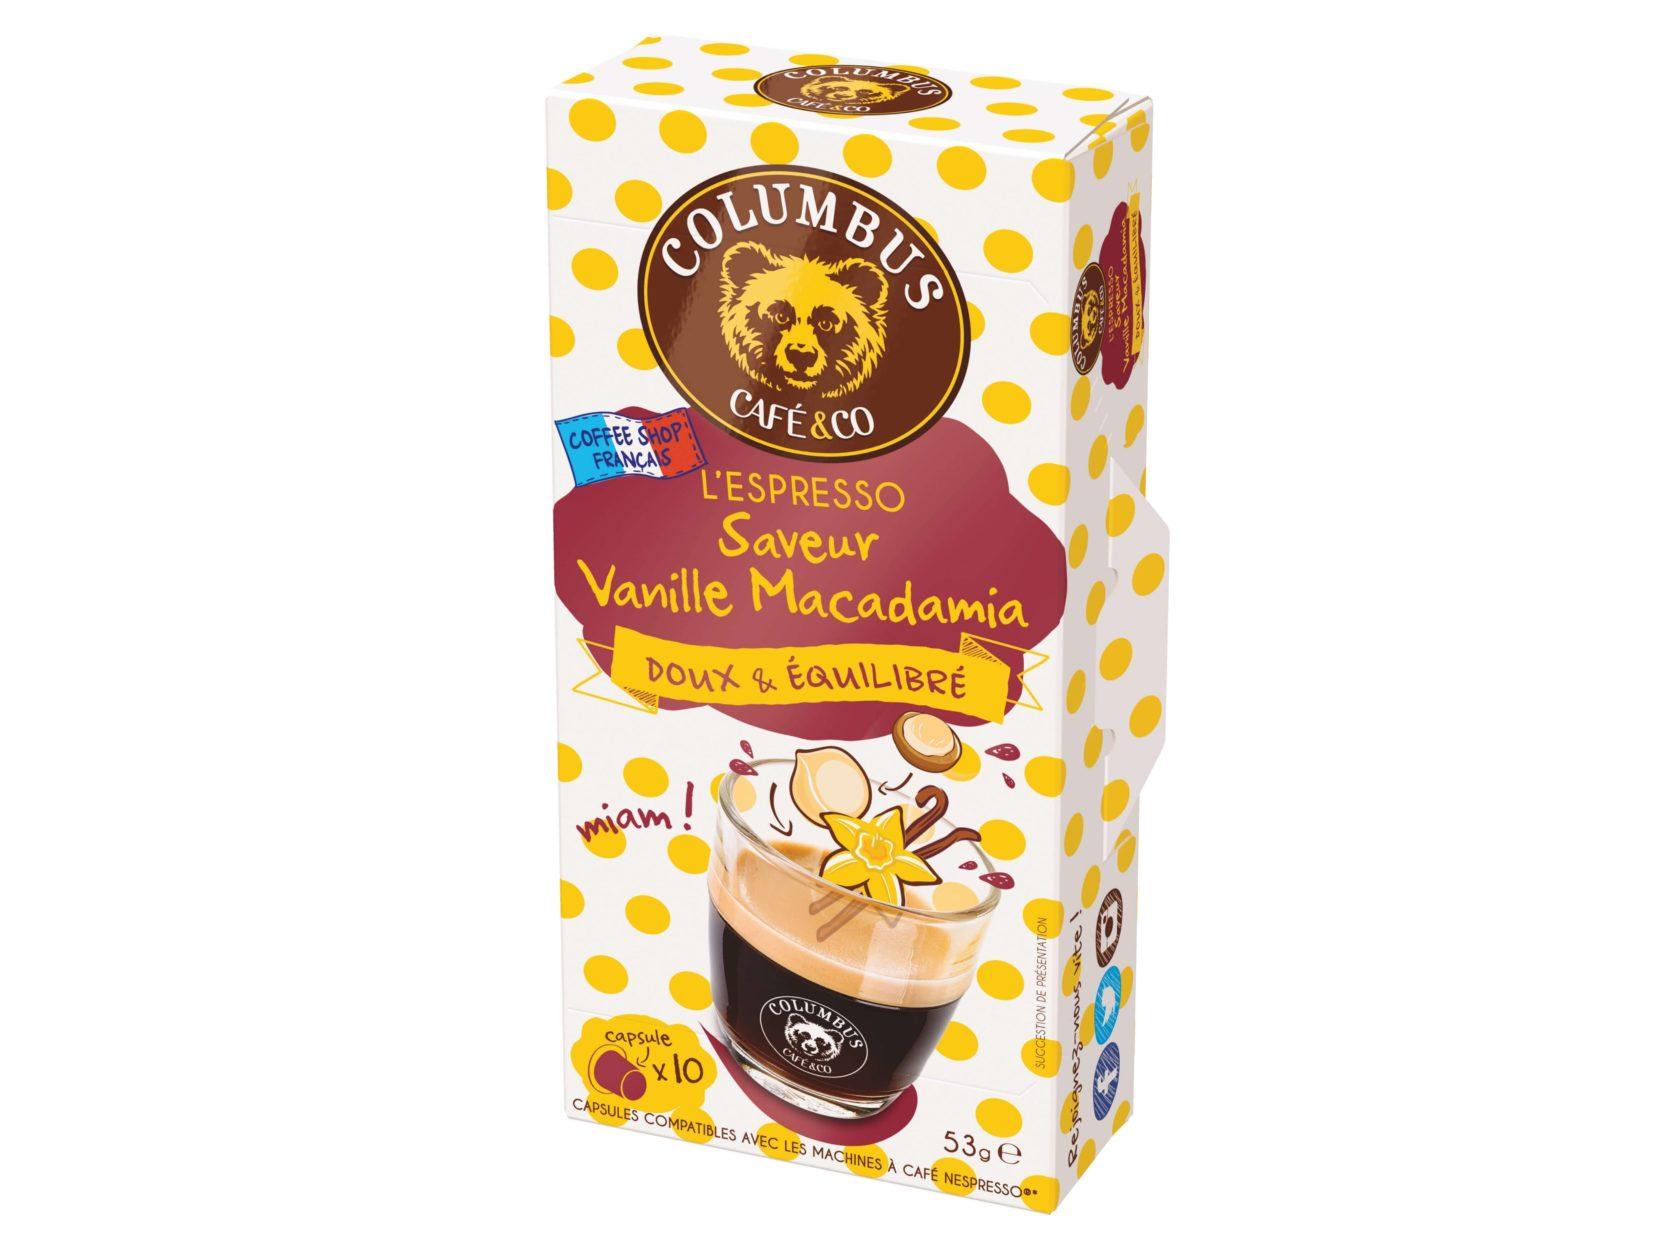 L'Espresso saveur Vanille Macadamia Nespresso® x 10